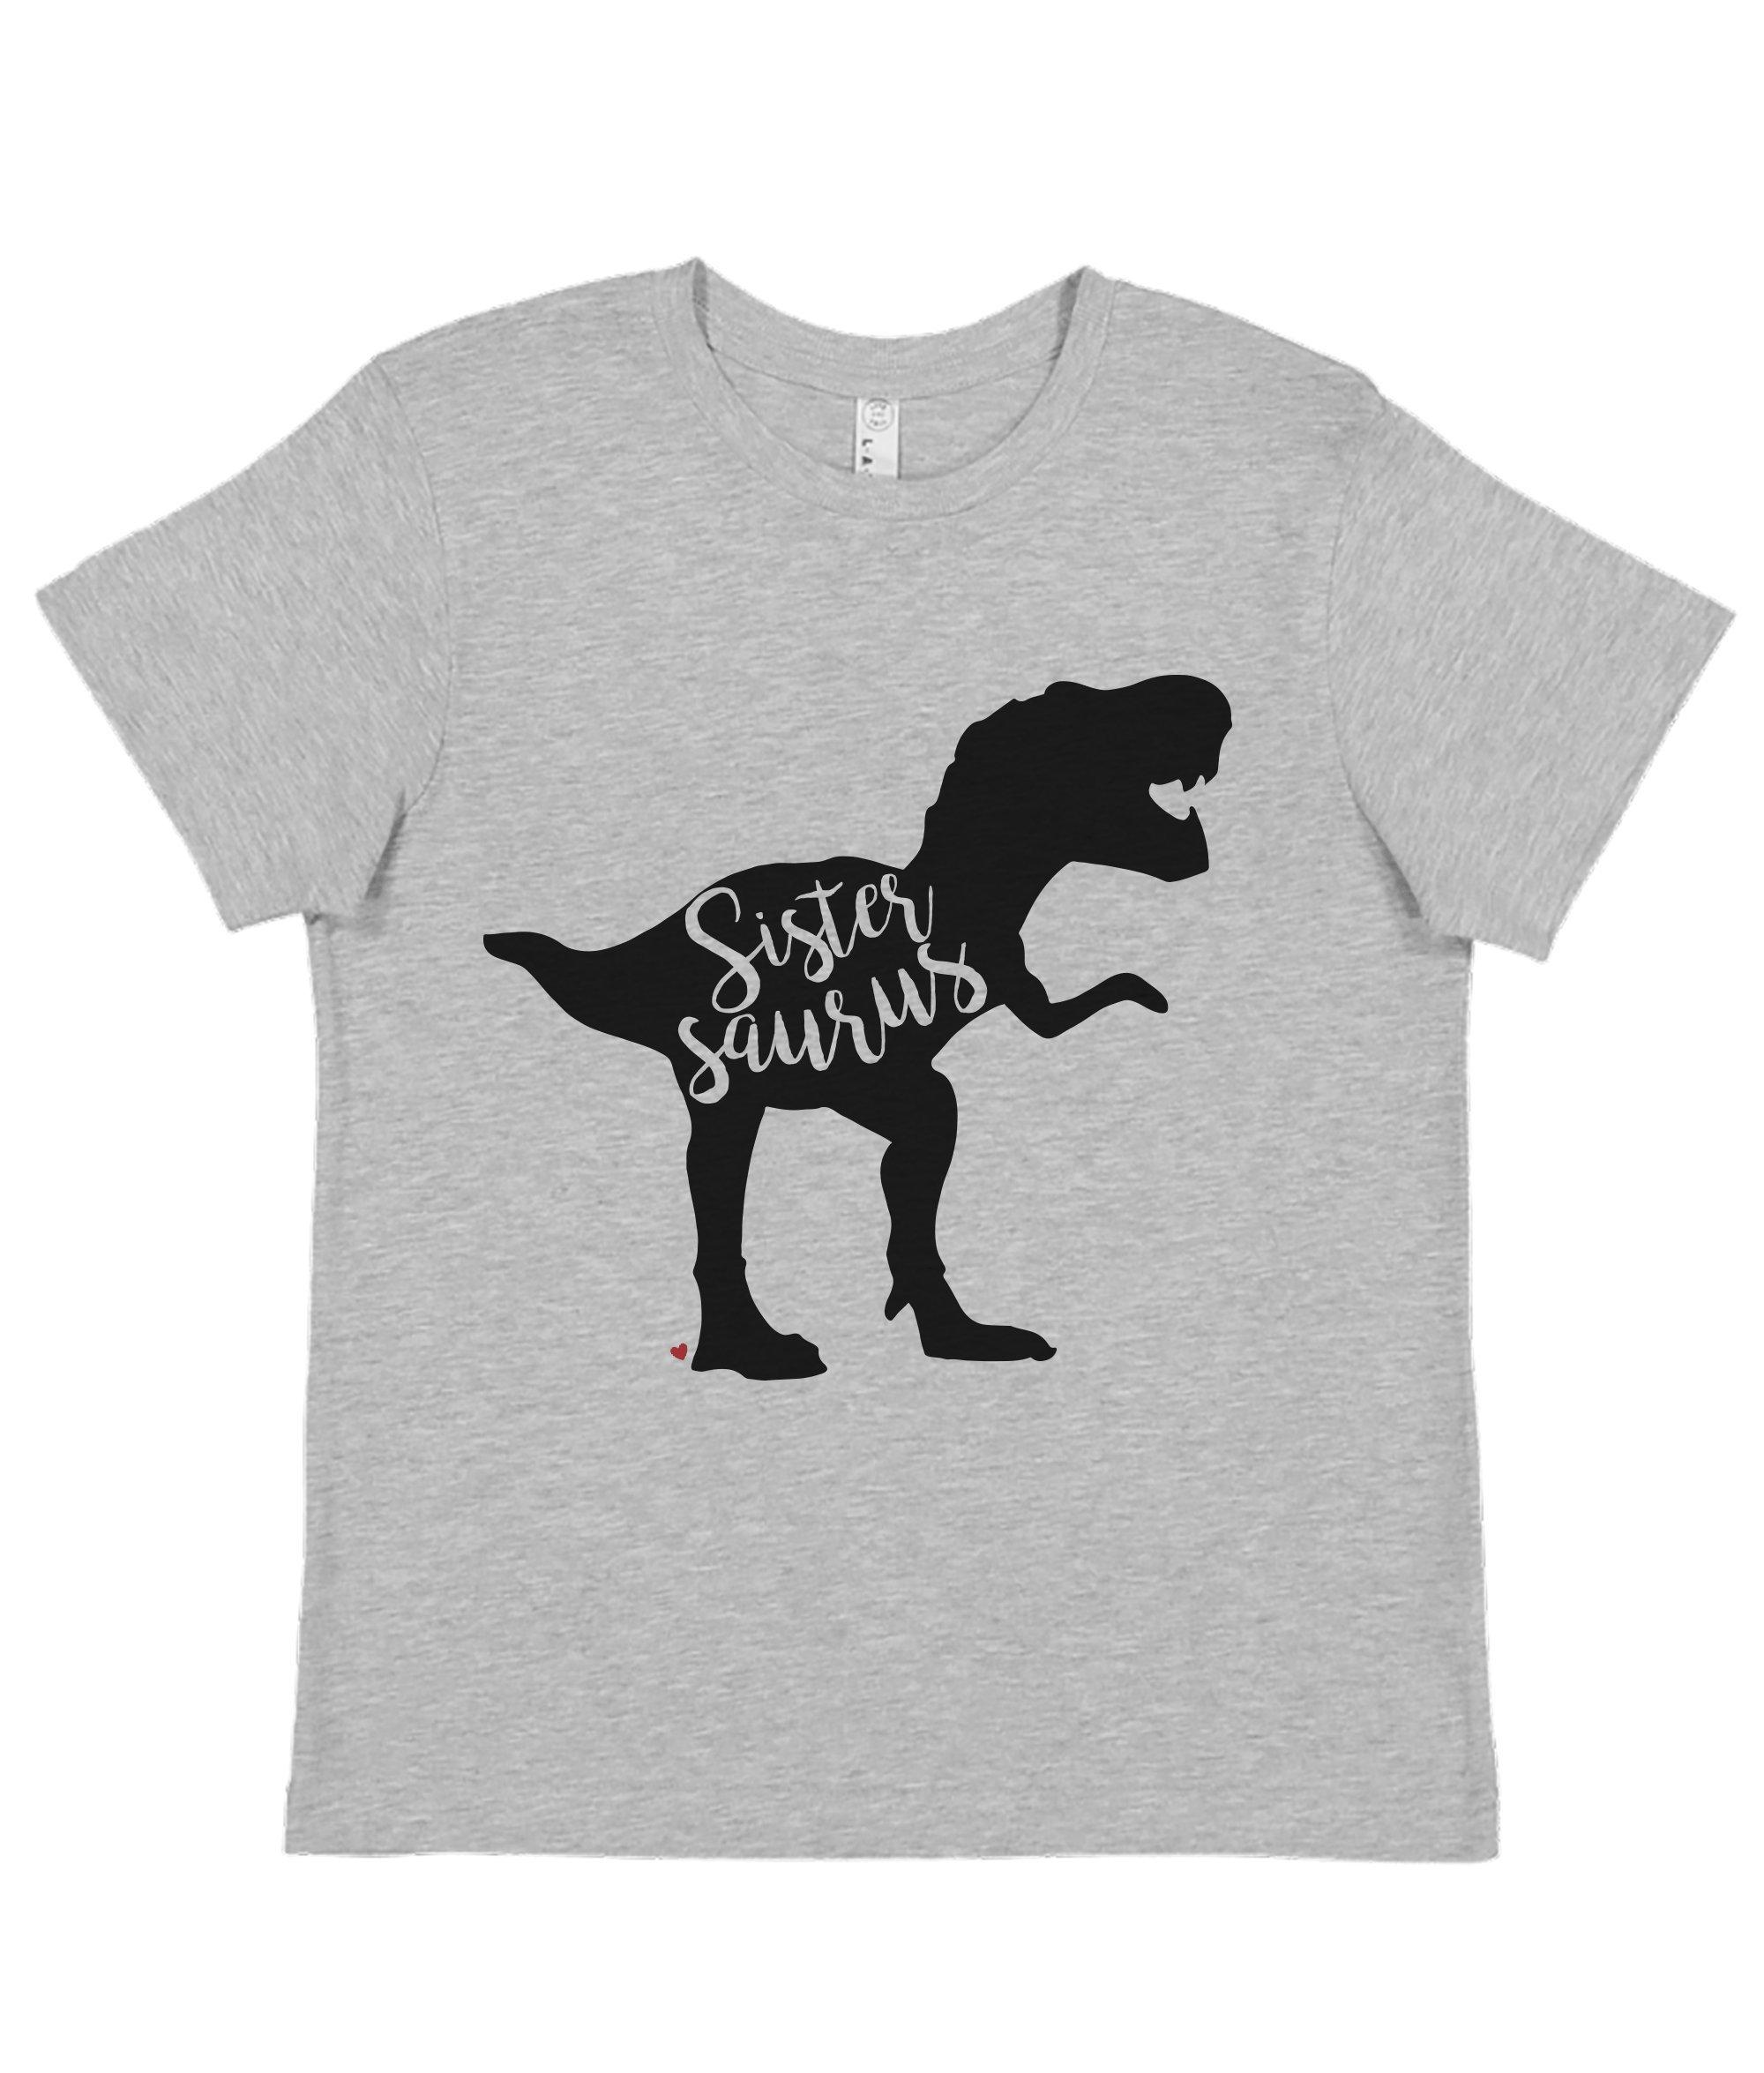 7 ate 9 Apparel Girl's Sister Dinosaur Grey T-Shirt